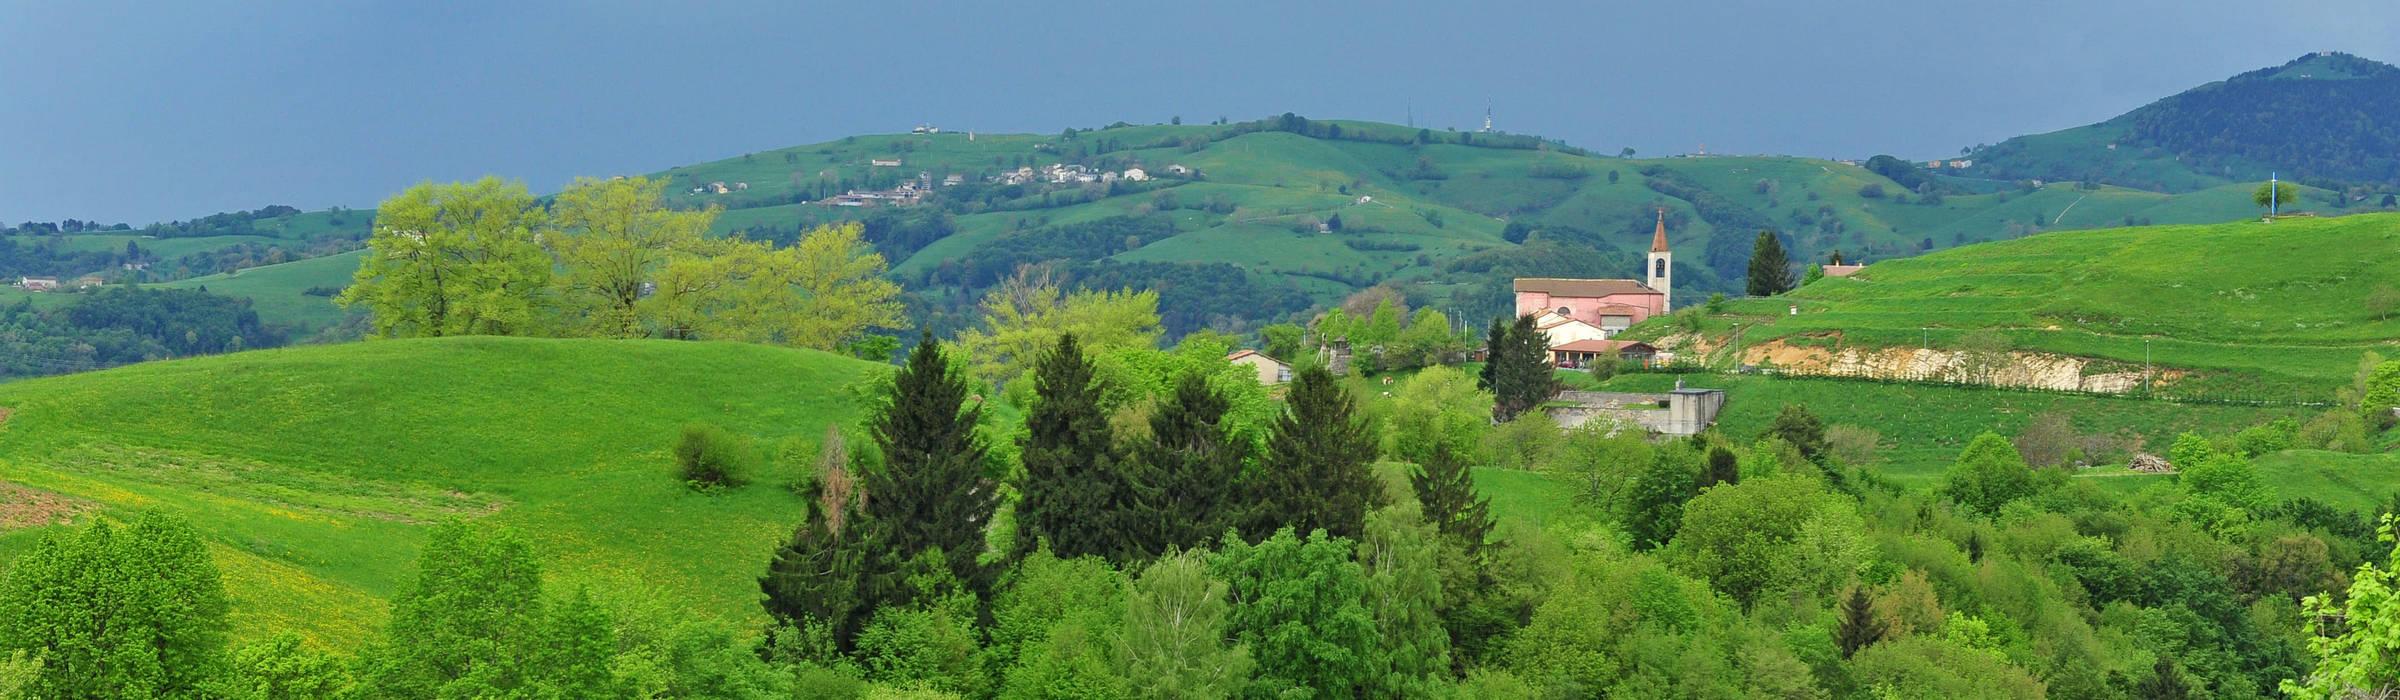 P01-Sprea-di-Badia-Calavena